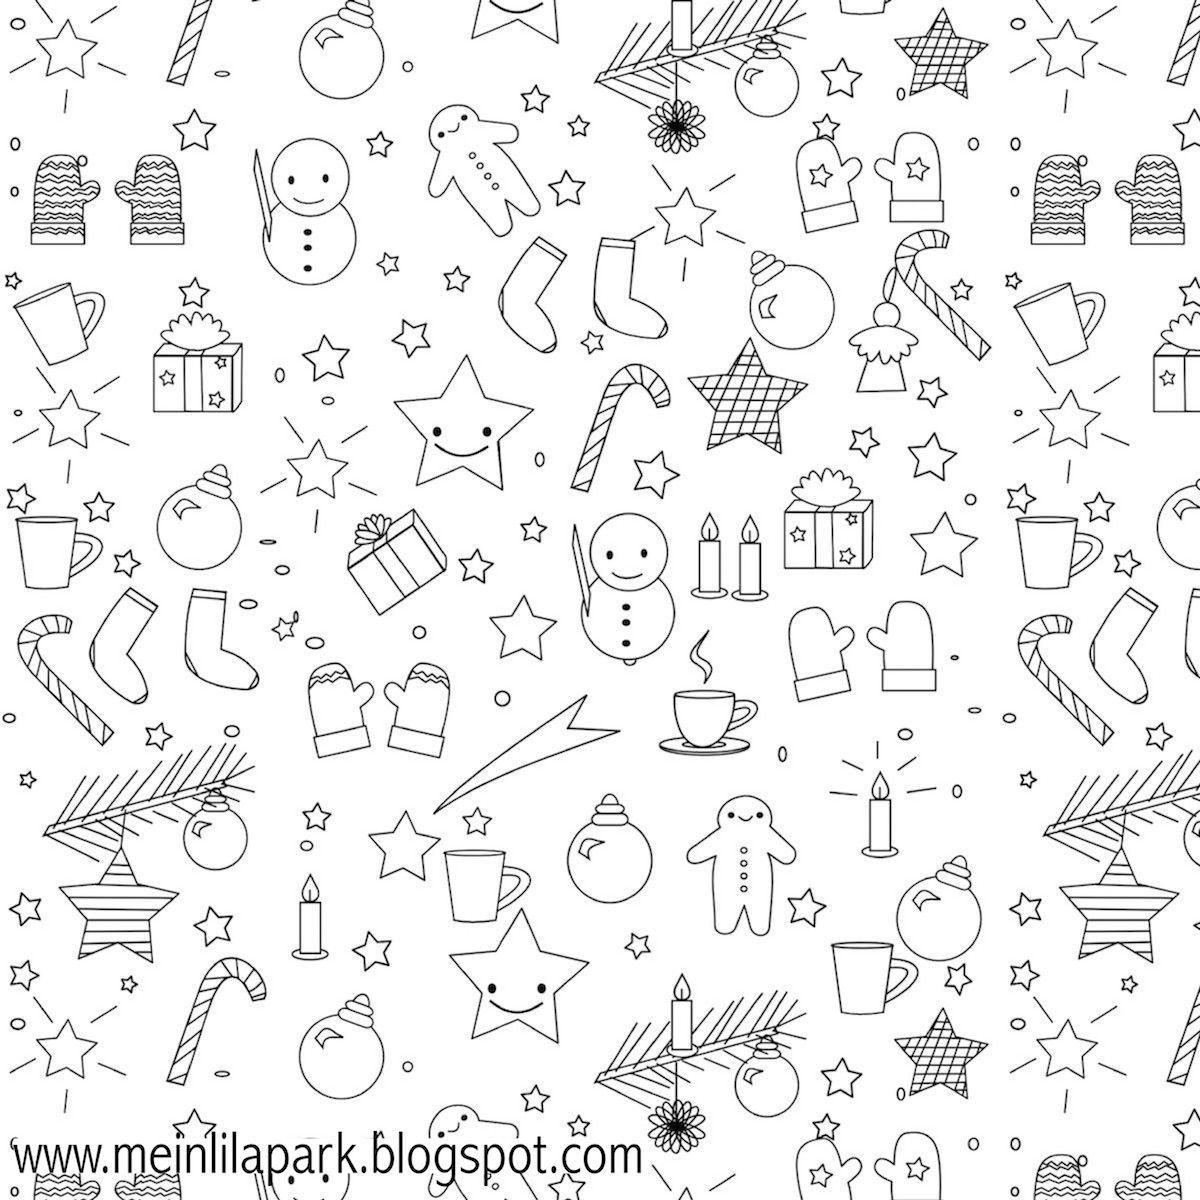 Free Printable Christmas Coloring Page Ausdruckbares Malblatt Freebie Weihnachtsmalvorlagen Weihnachtsfarben Druckvorlagen Fur Weihnachten